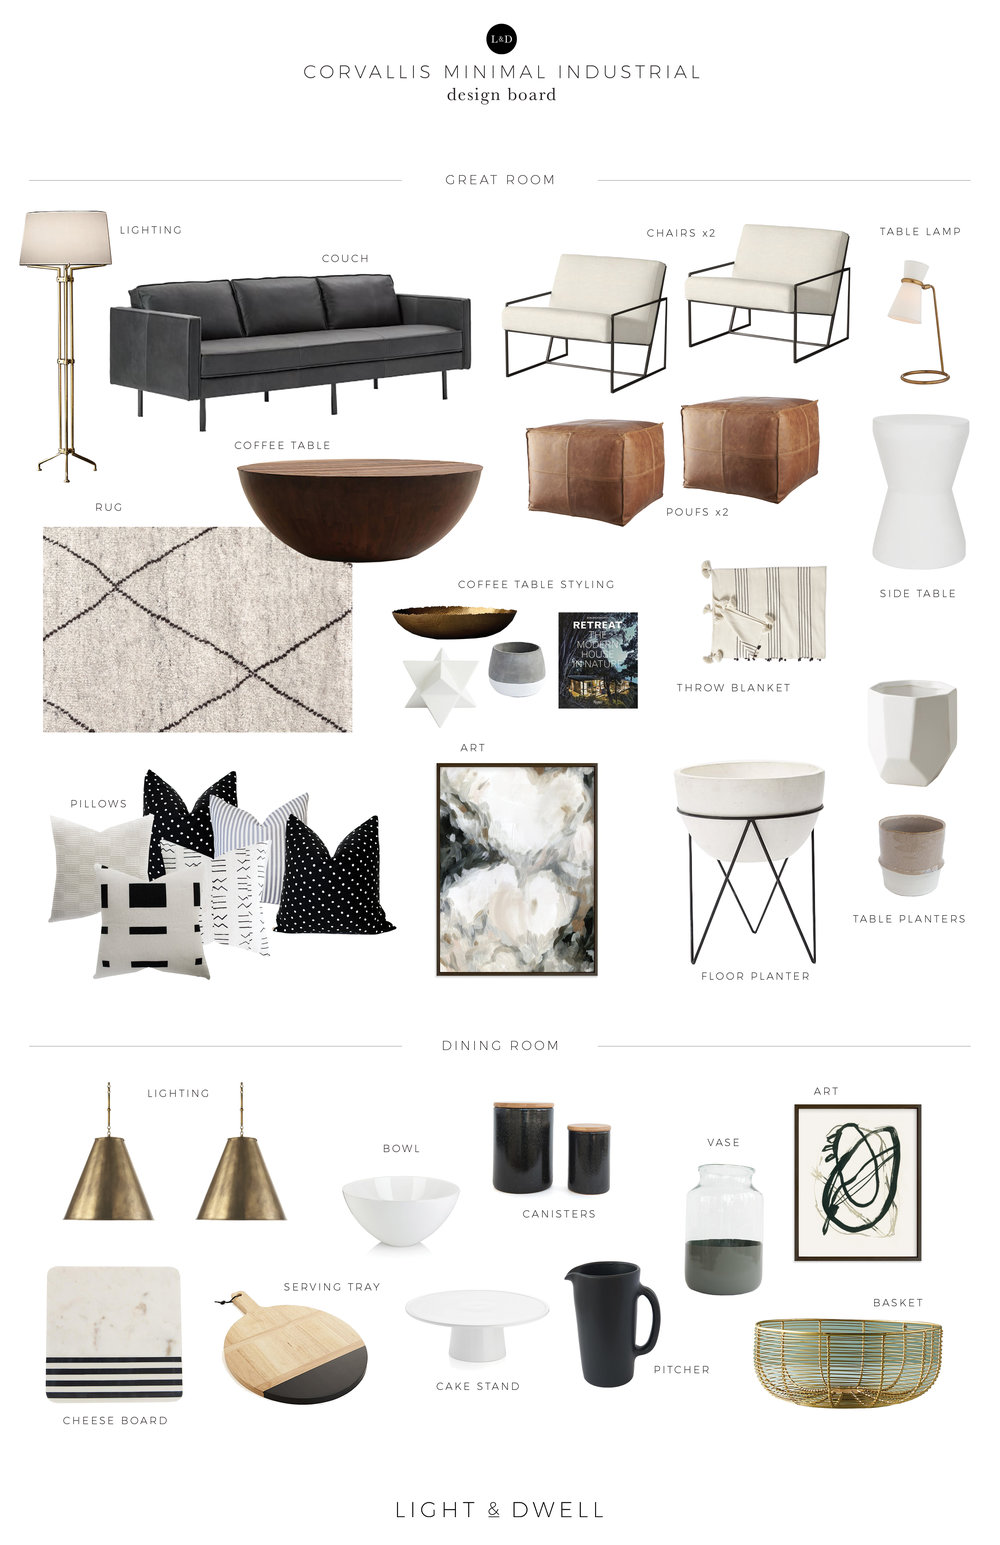 L+D_DesignBoard_CORVALLISminimalindustrial.jpg